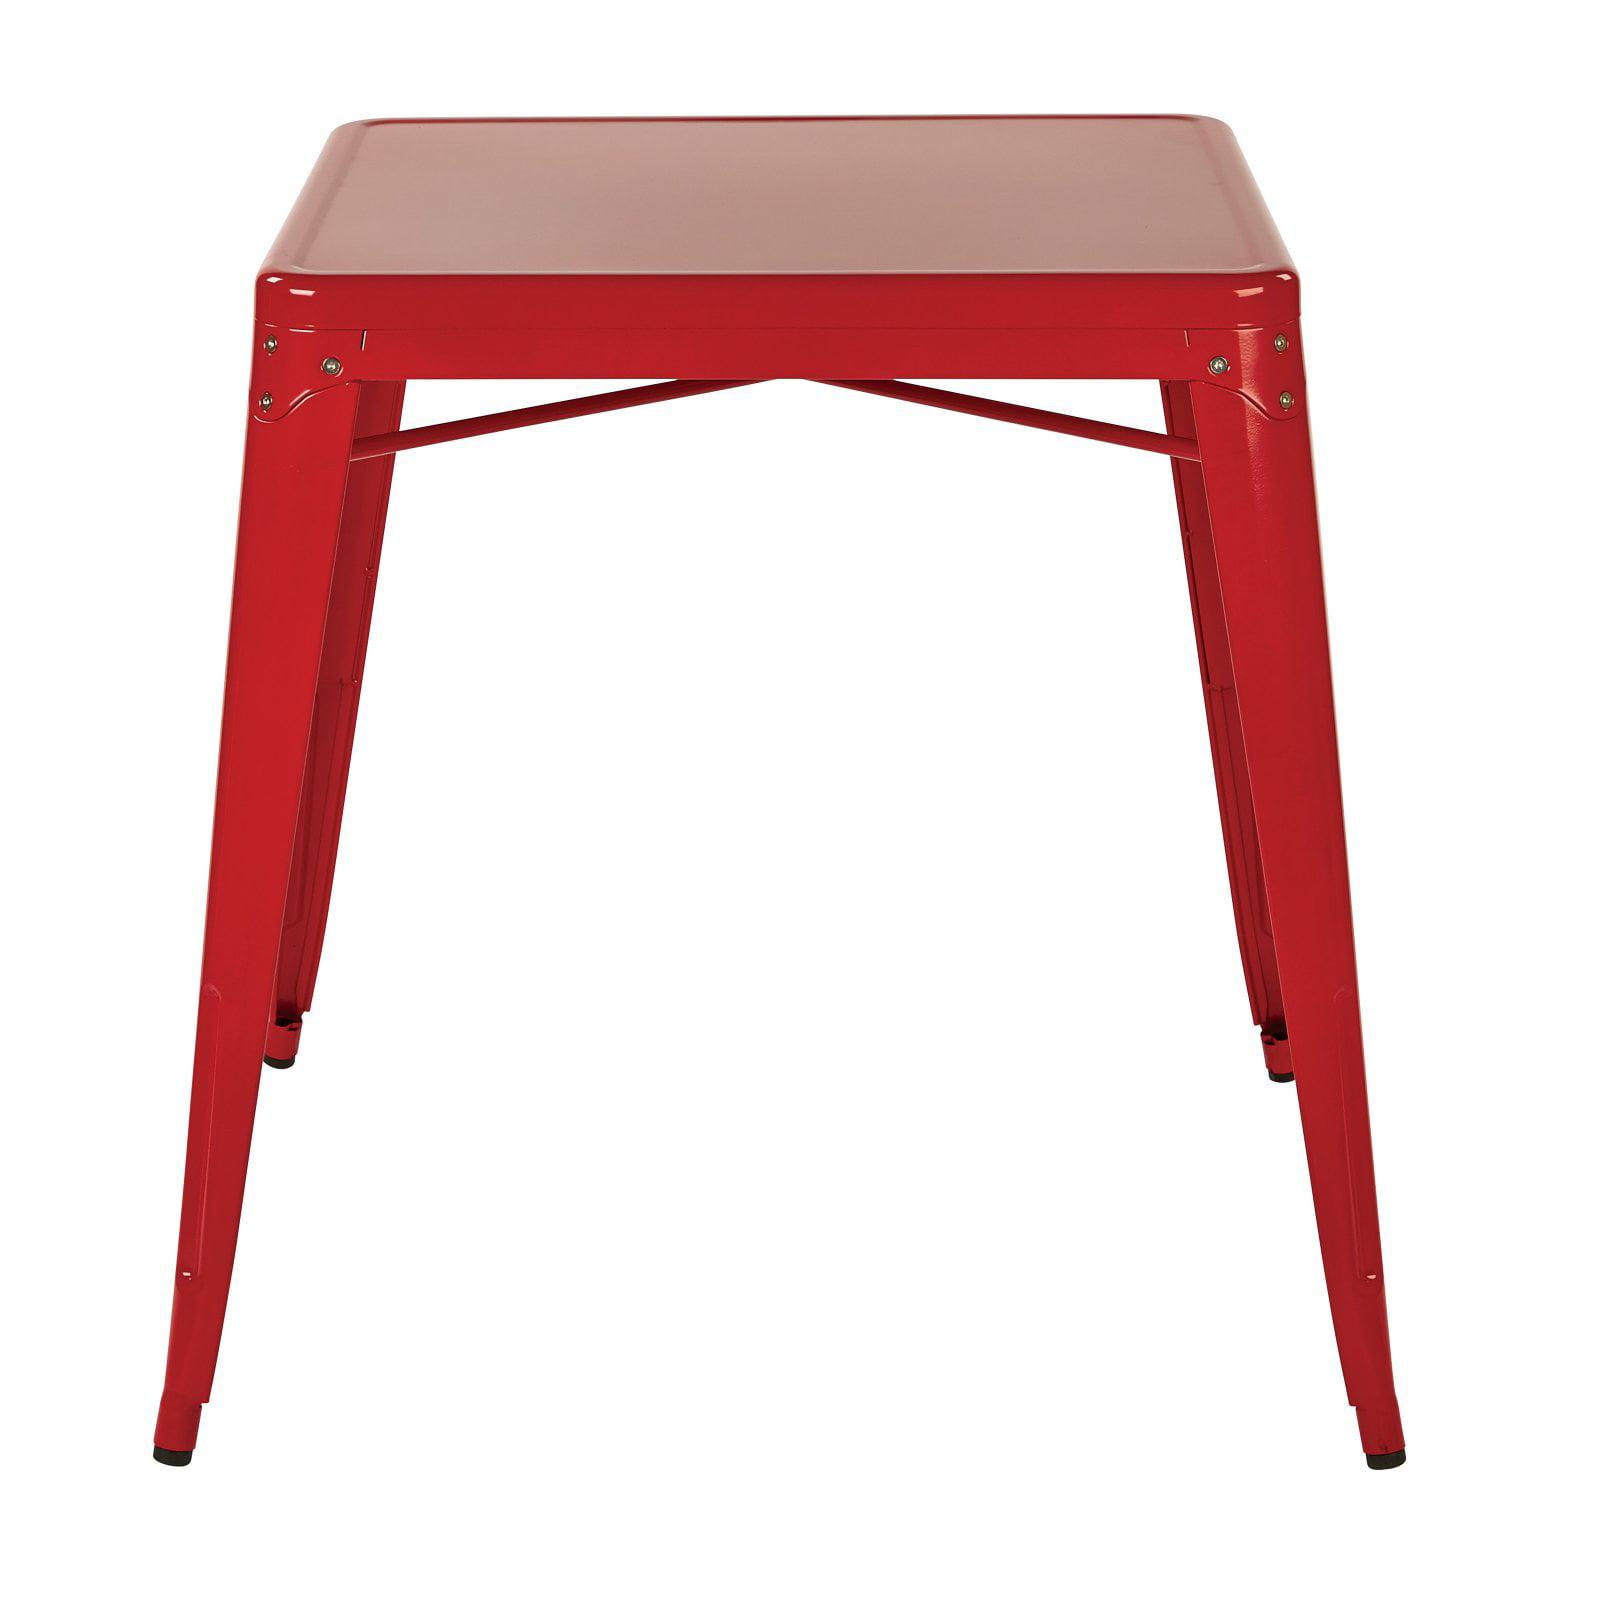 Patterson Metal Table